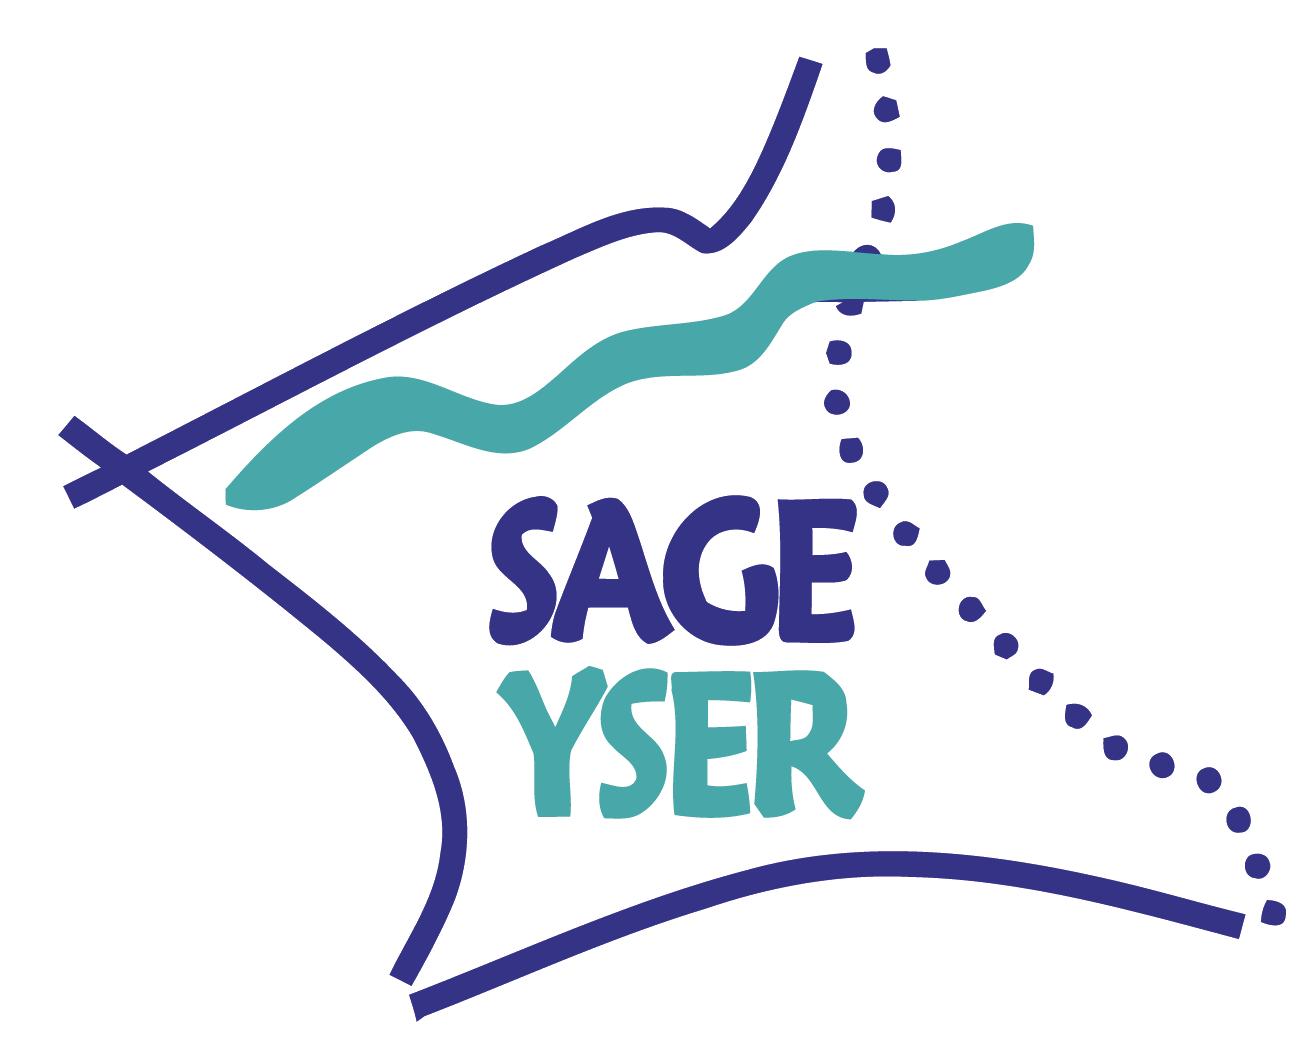 logo_sage_yser_vecteur_eps